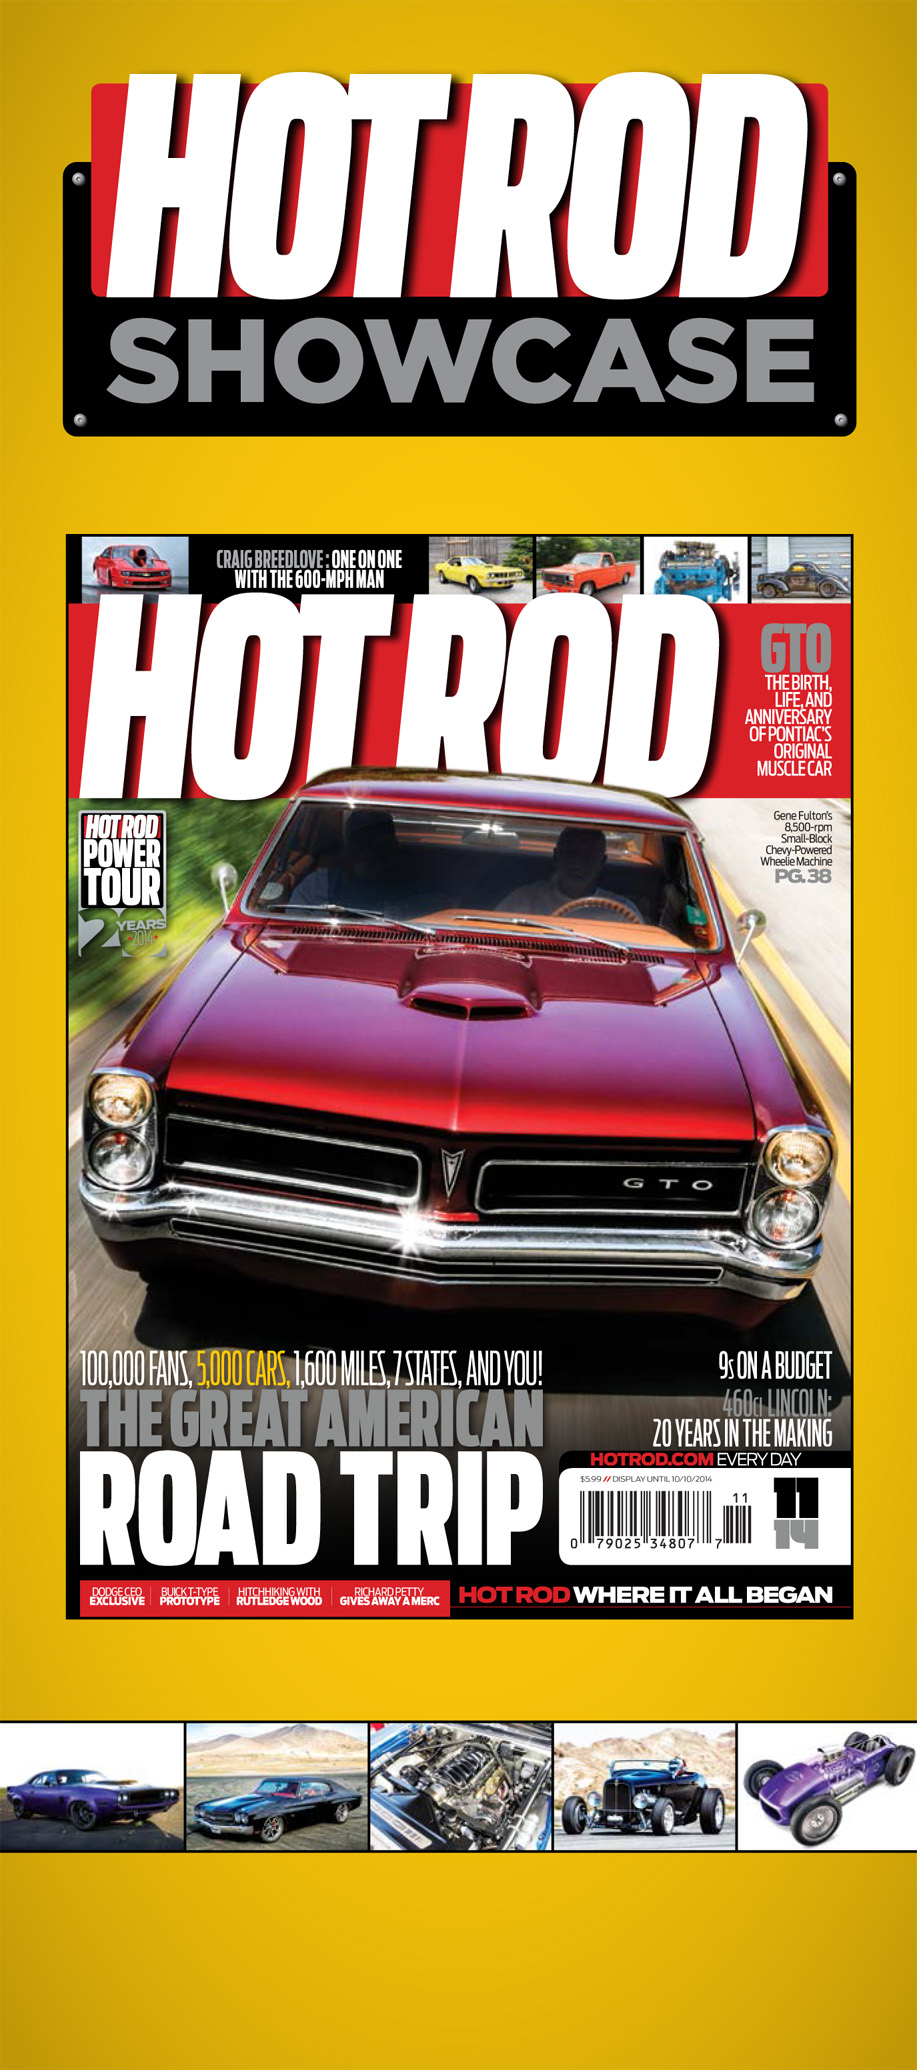 Hot Rod Showcase Meterboard